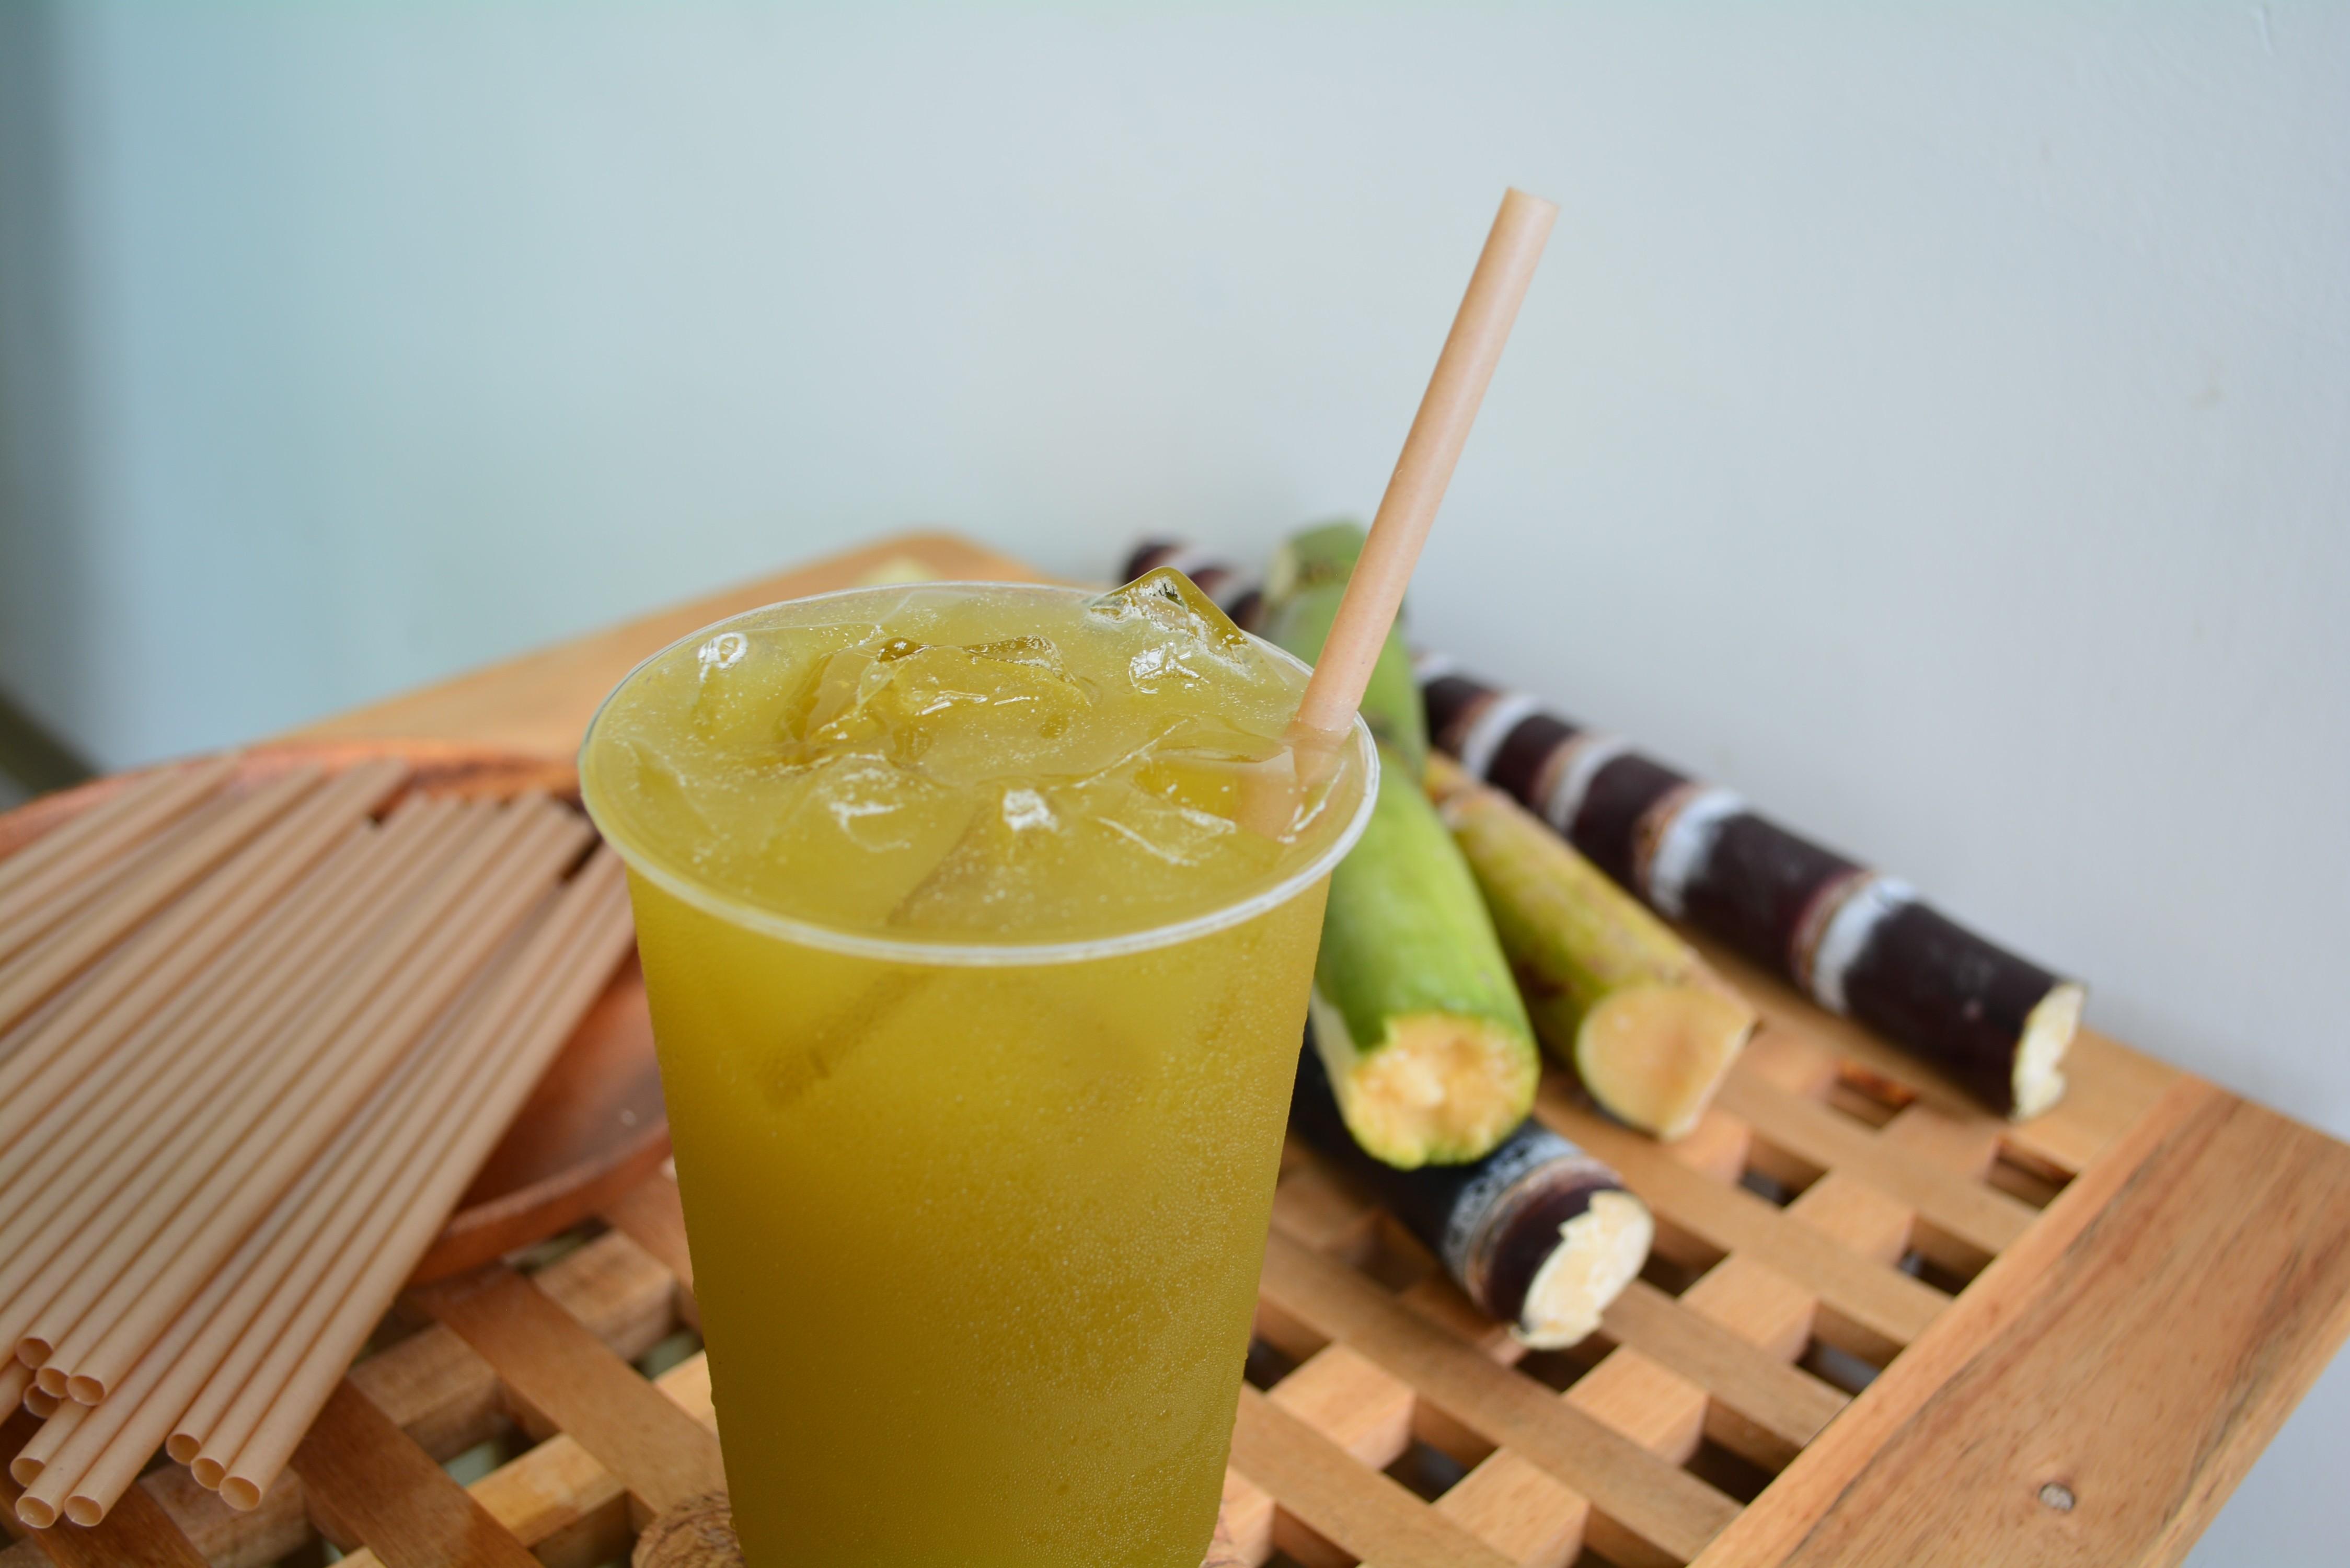 Sugarcane straws